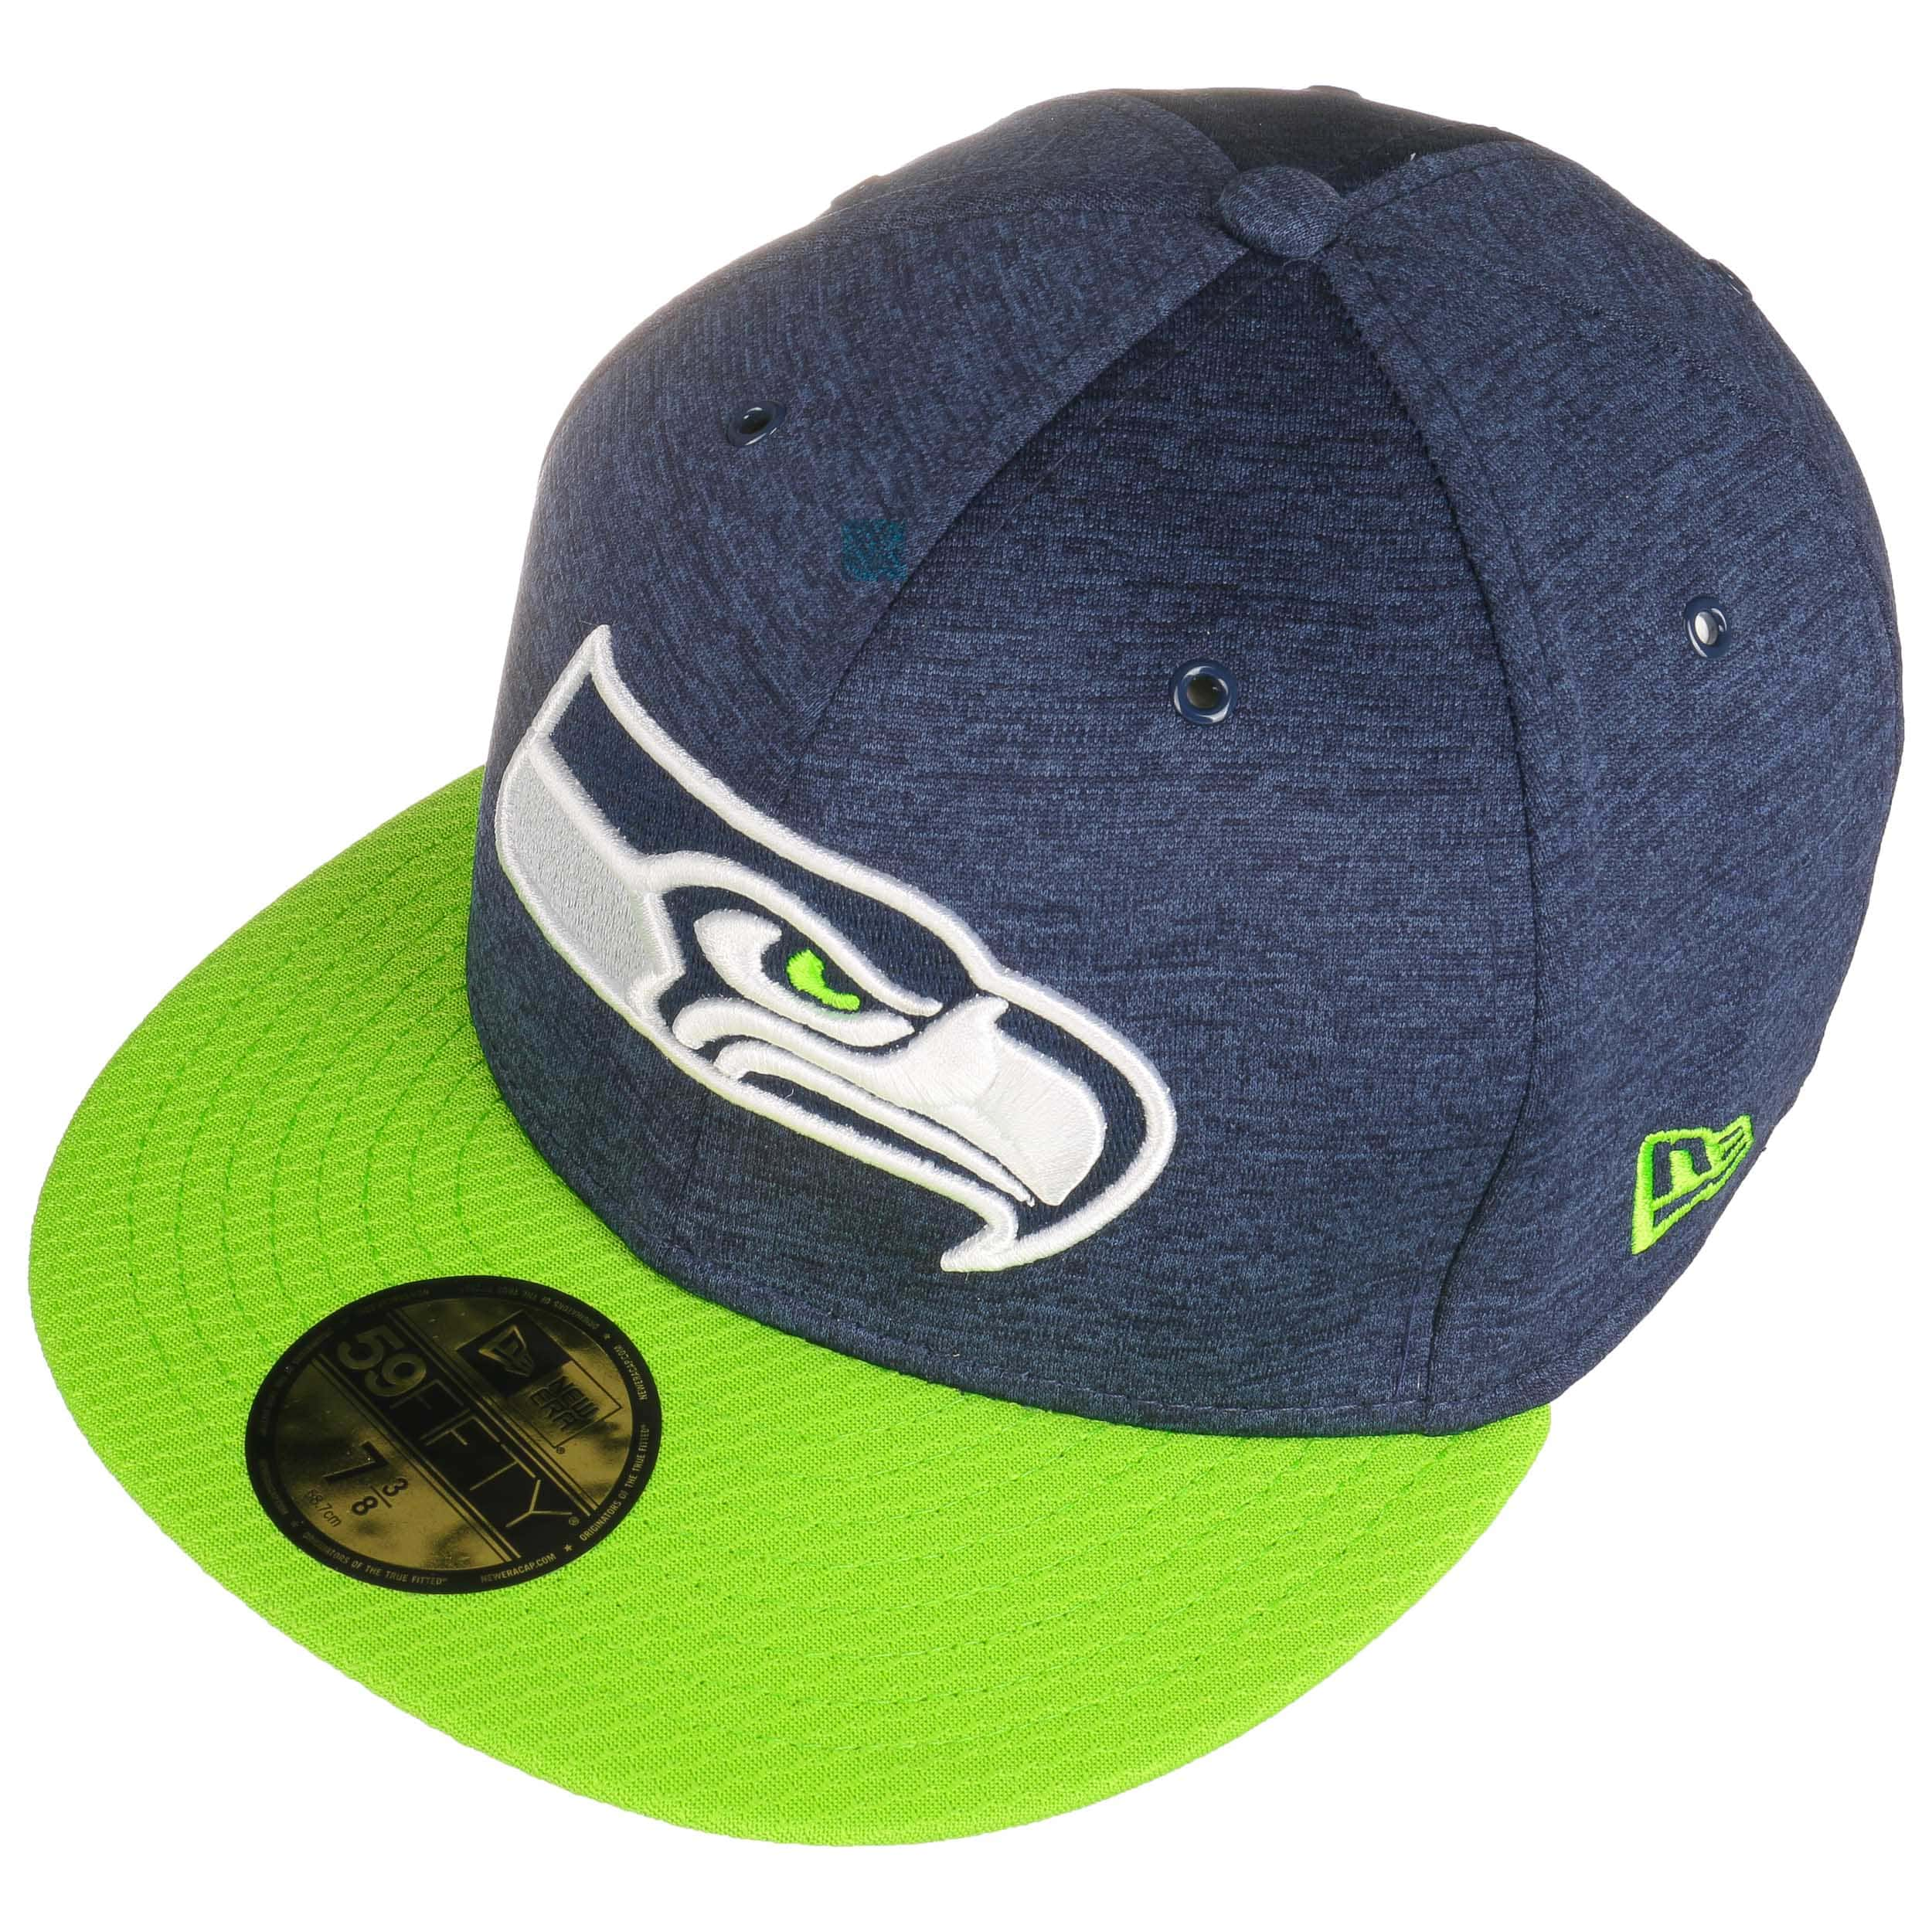 Gorra 59Fifty On-Field 18 Seahawks by New Era - Gorras - sombreroshop.es fee2035523e